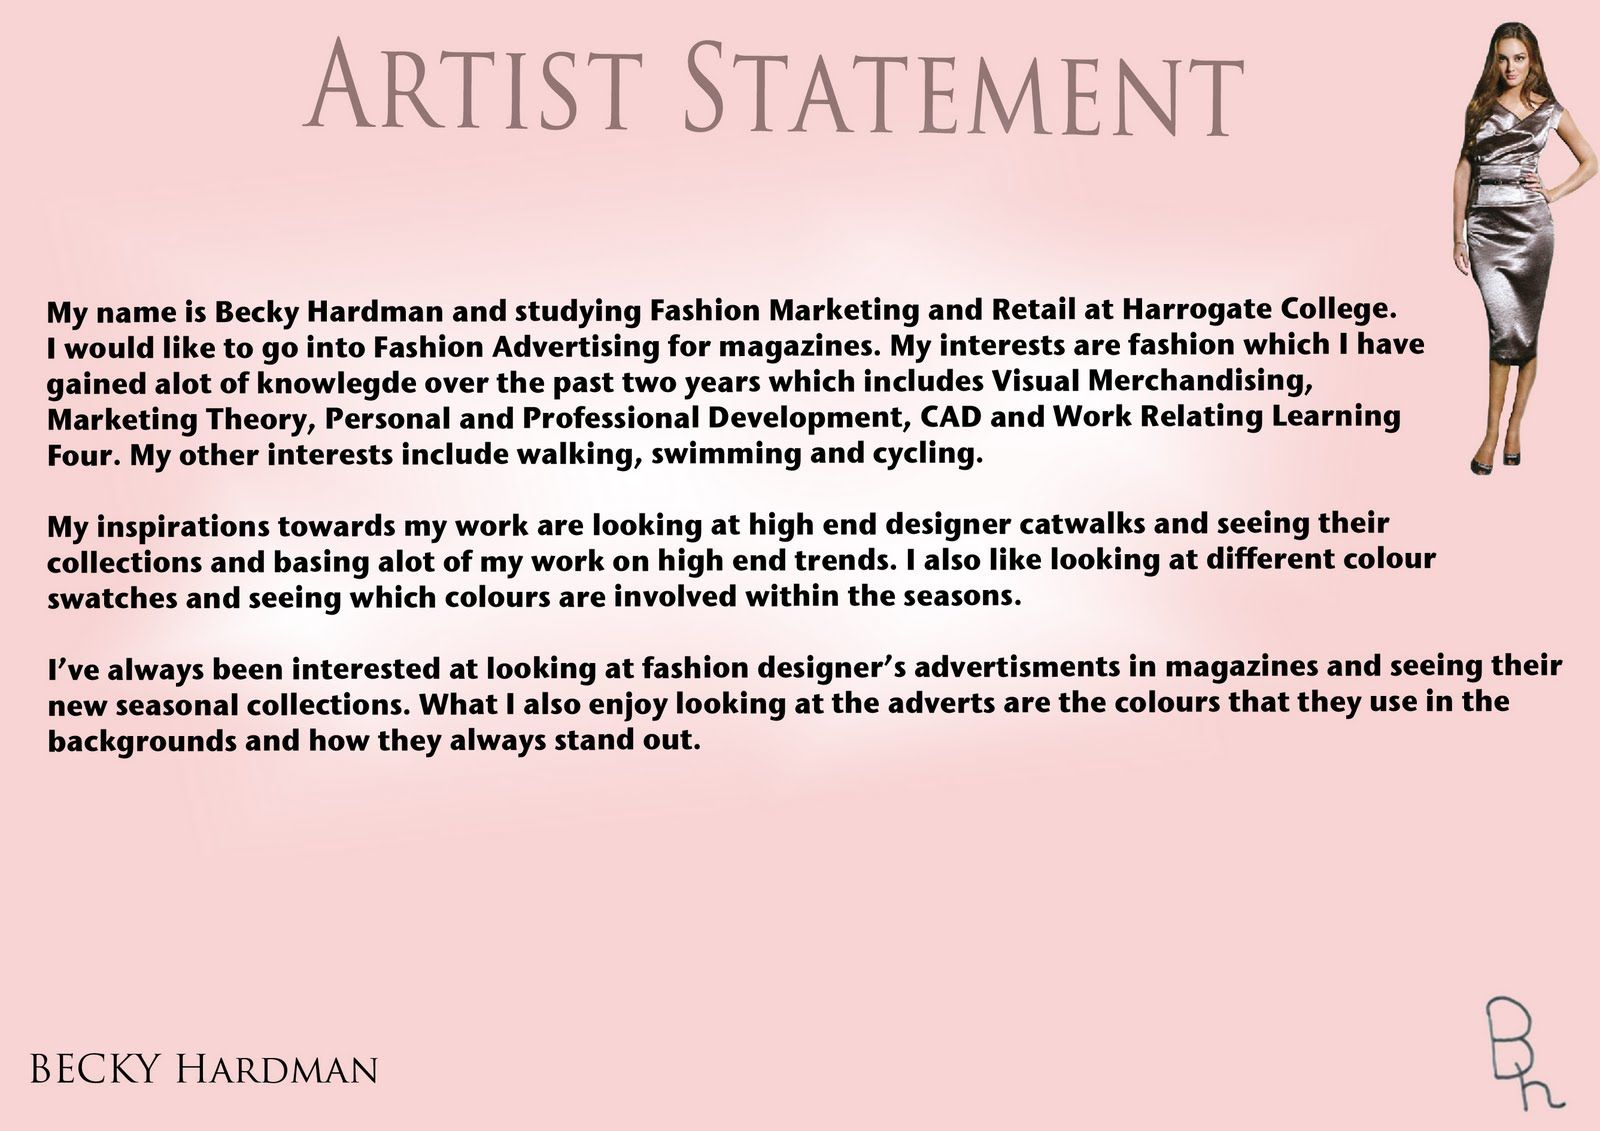 Artist Statement Worksheet   Printable Worksheets And Activities For  Teachers, Parents, Tutors And Homeschool Families